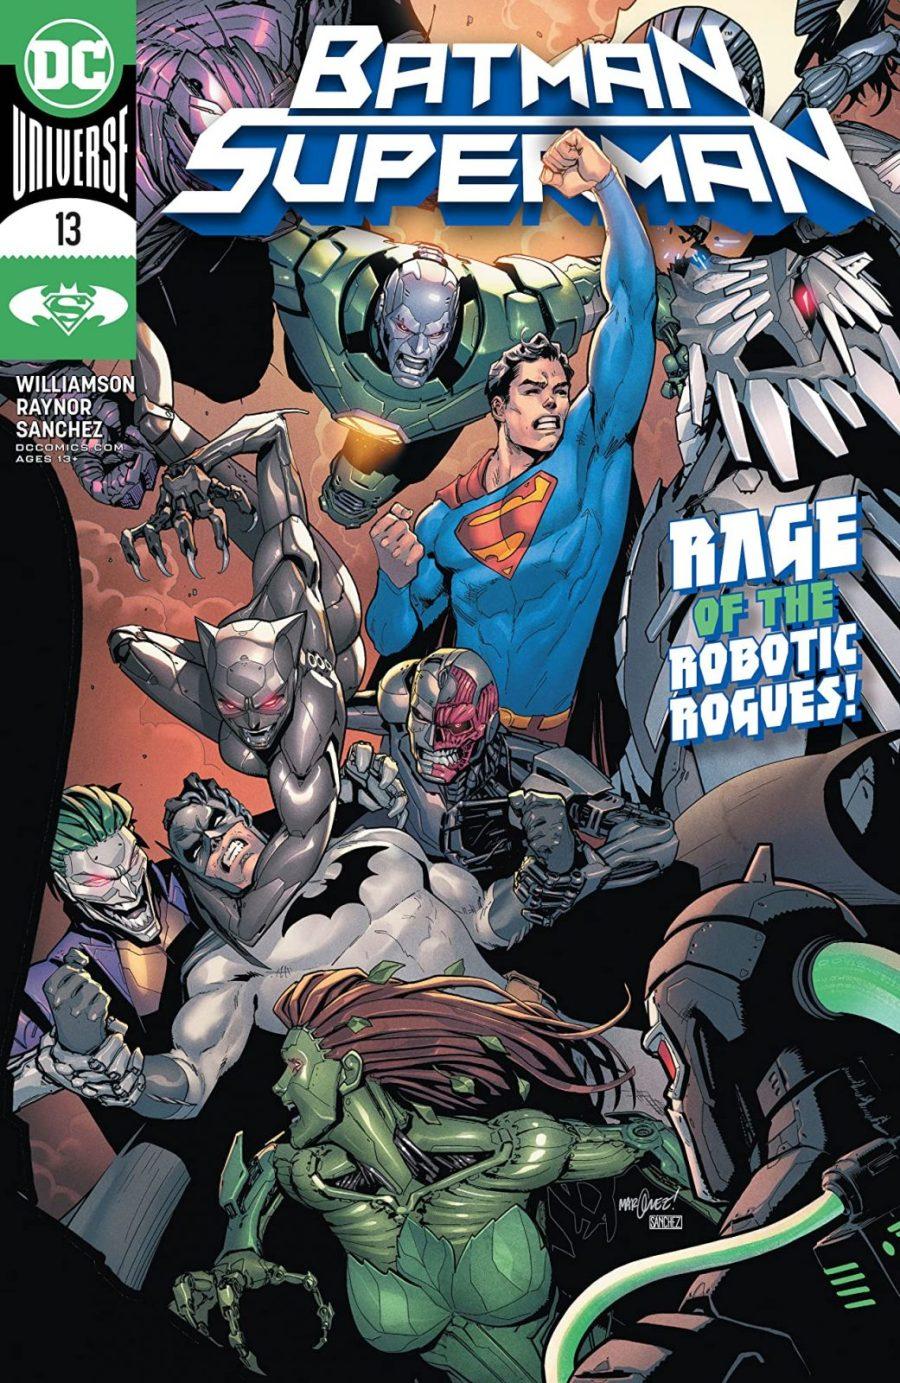 BATMAN/SUPERMAN #13 – The Aspiring Kryptonian